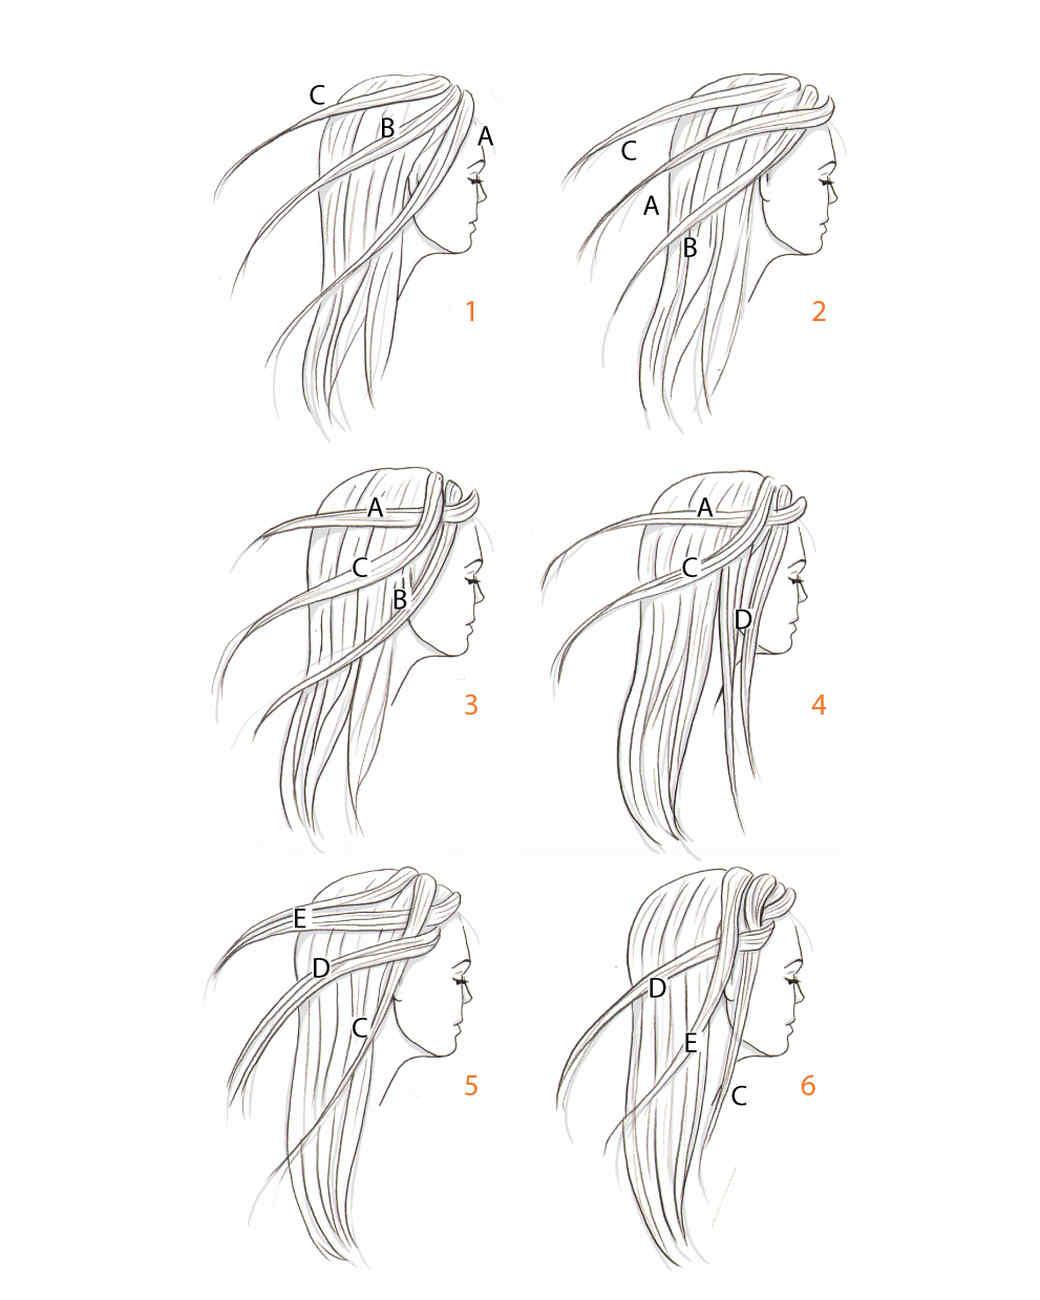 braids-french-braid-illustration-mi108987.jpg